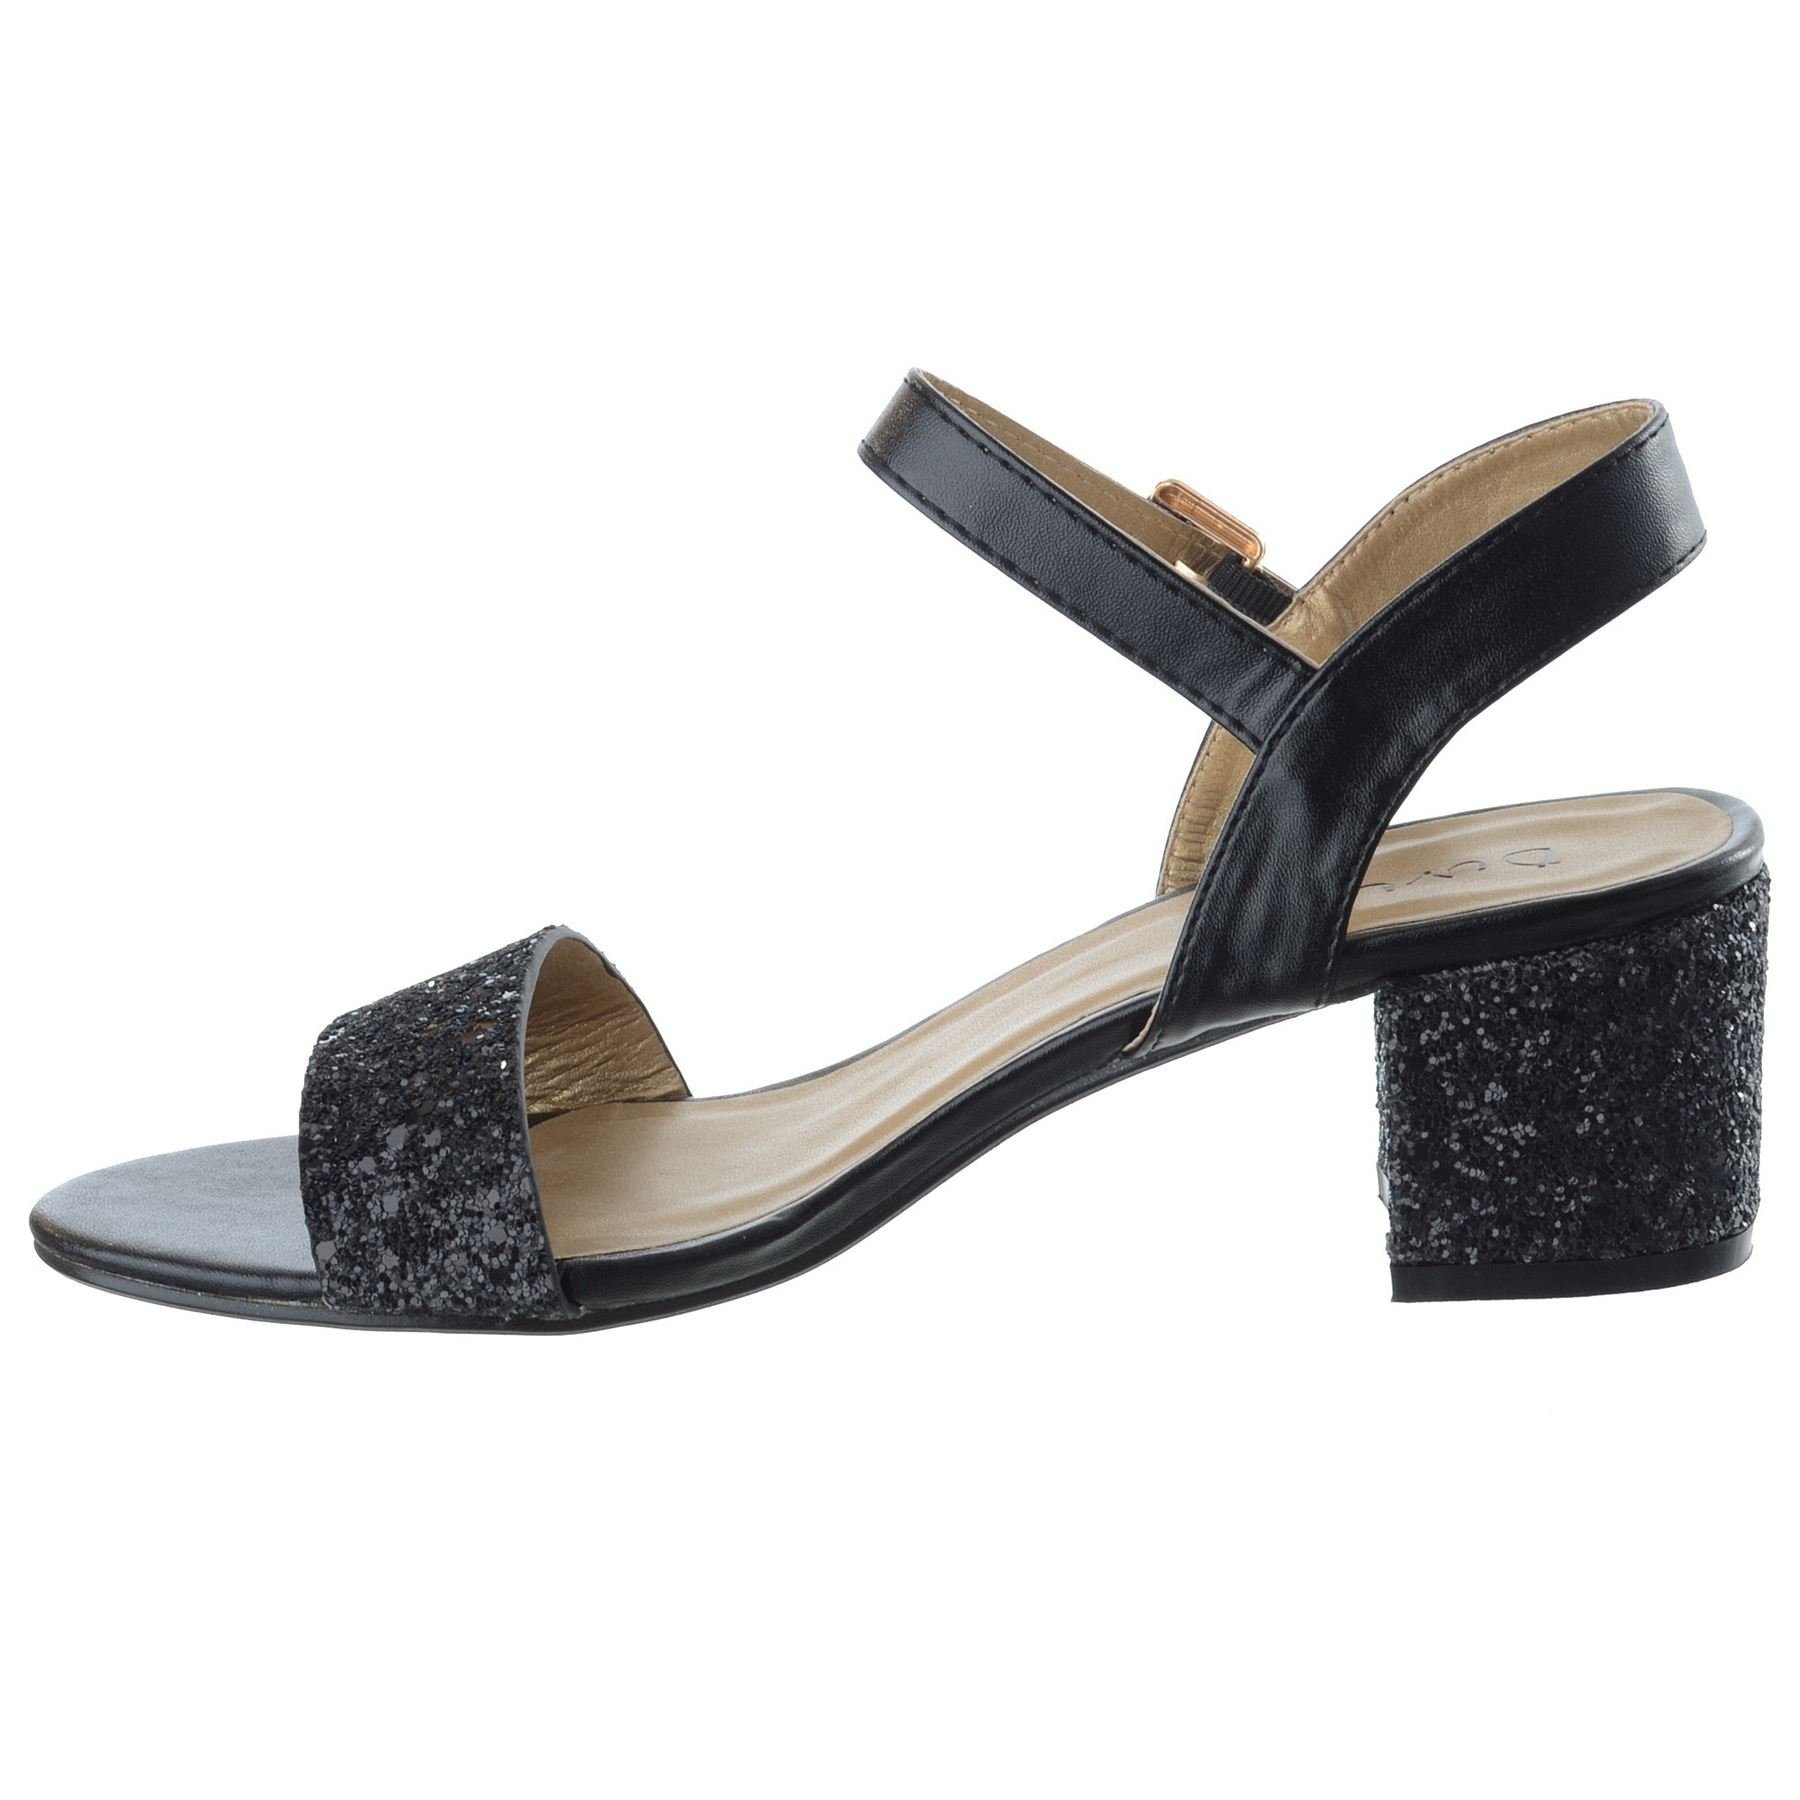 Ladies Womens Low Block Heel Party Bridal Glitter Sandals ...